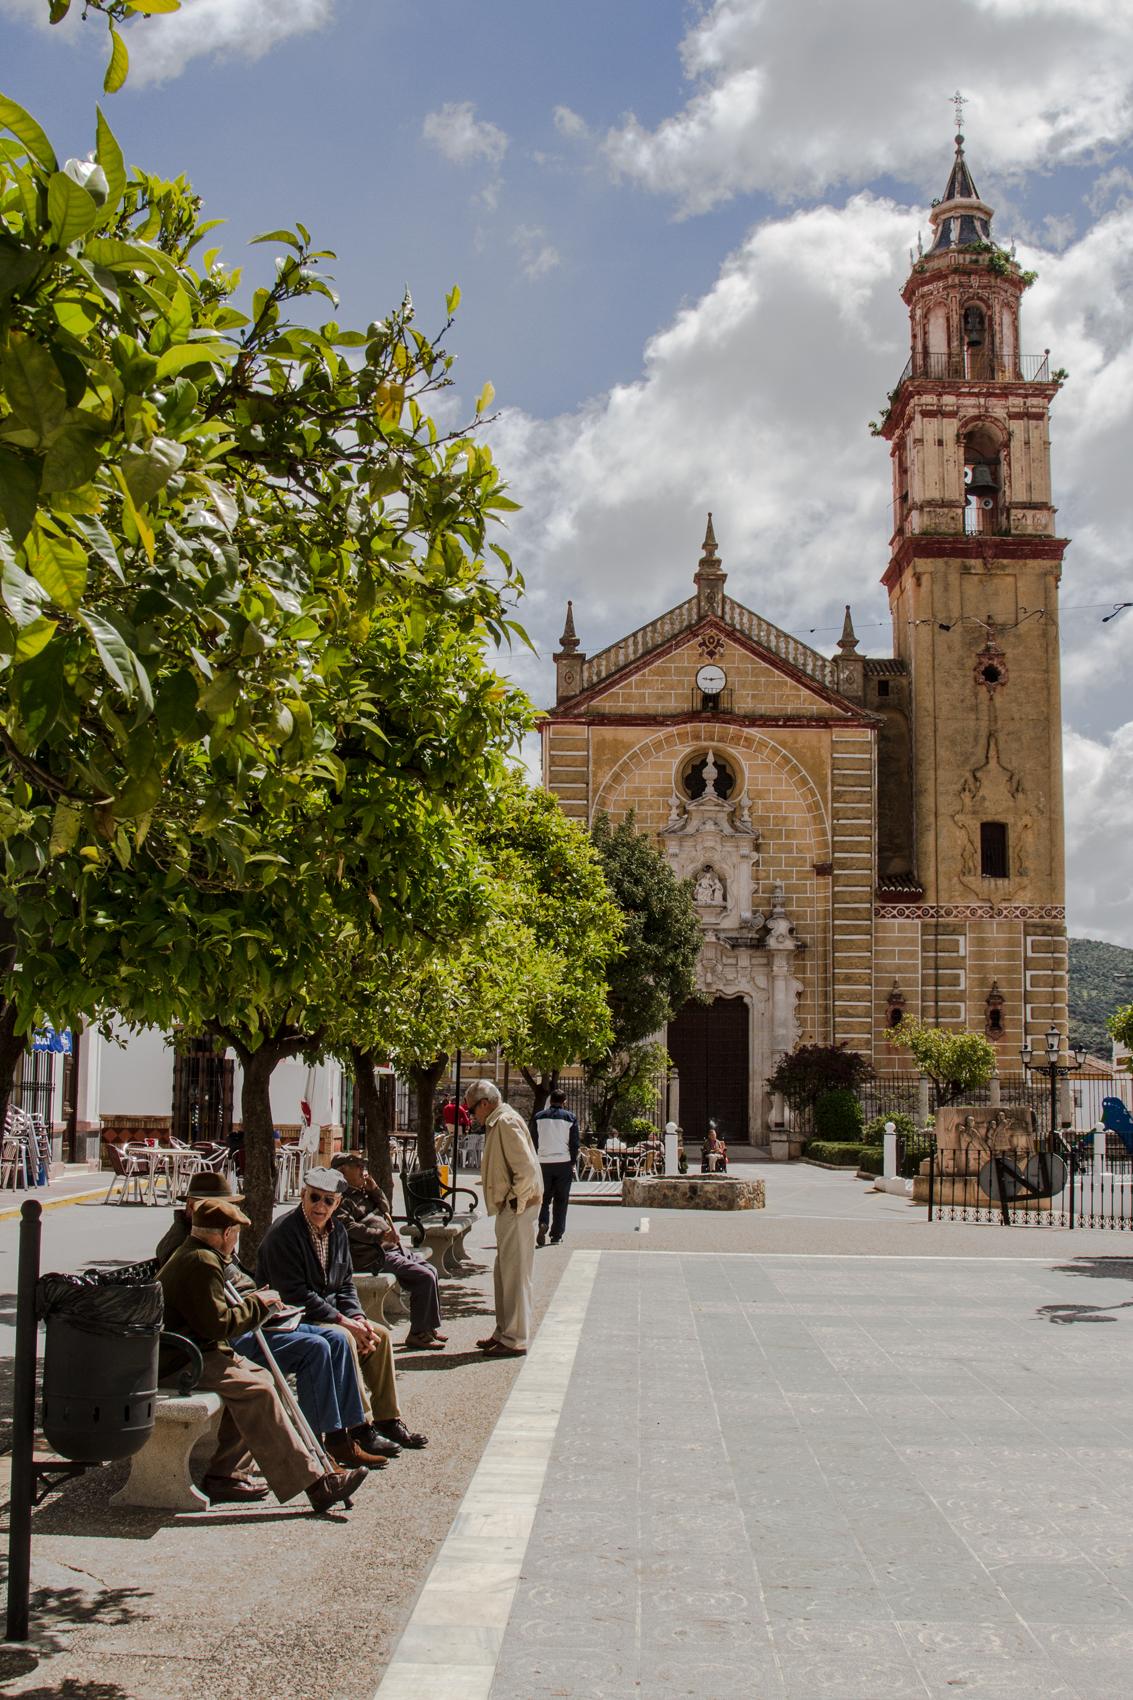 Town square, Grazalema